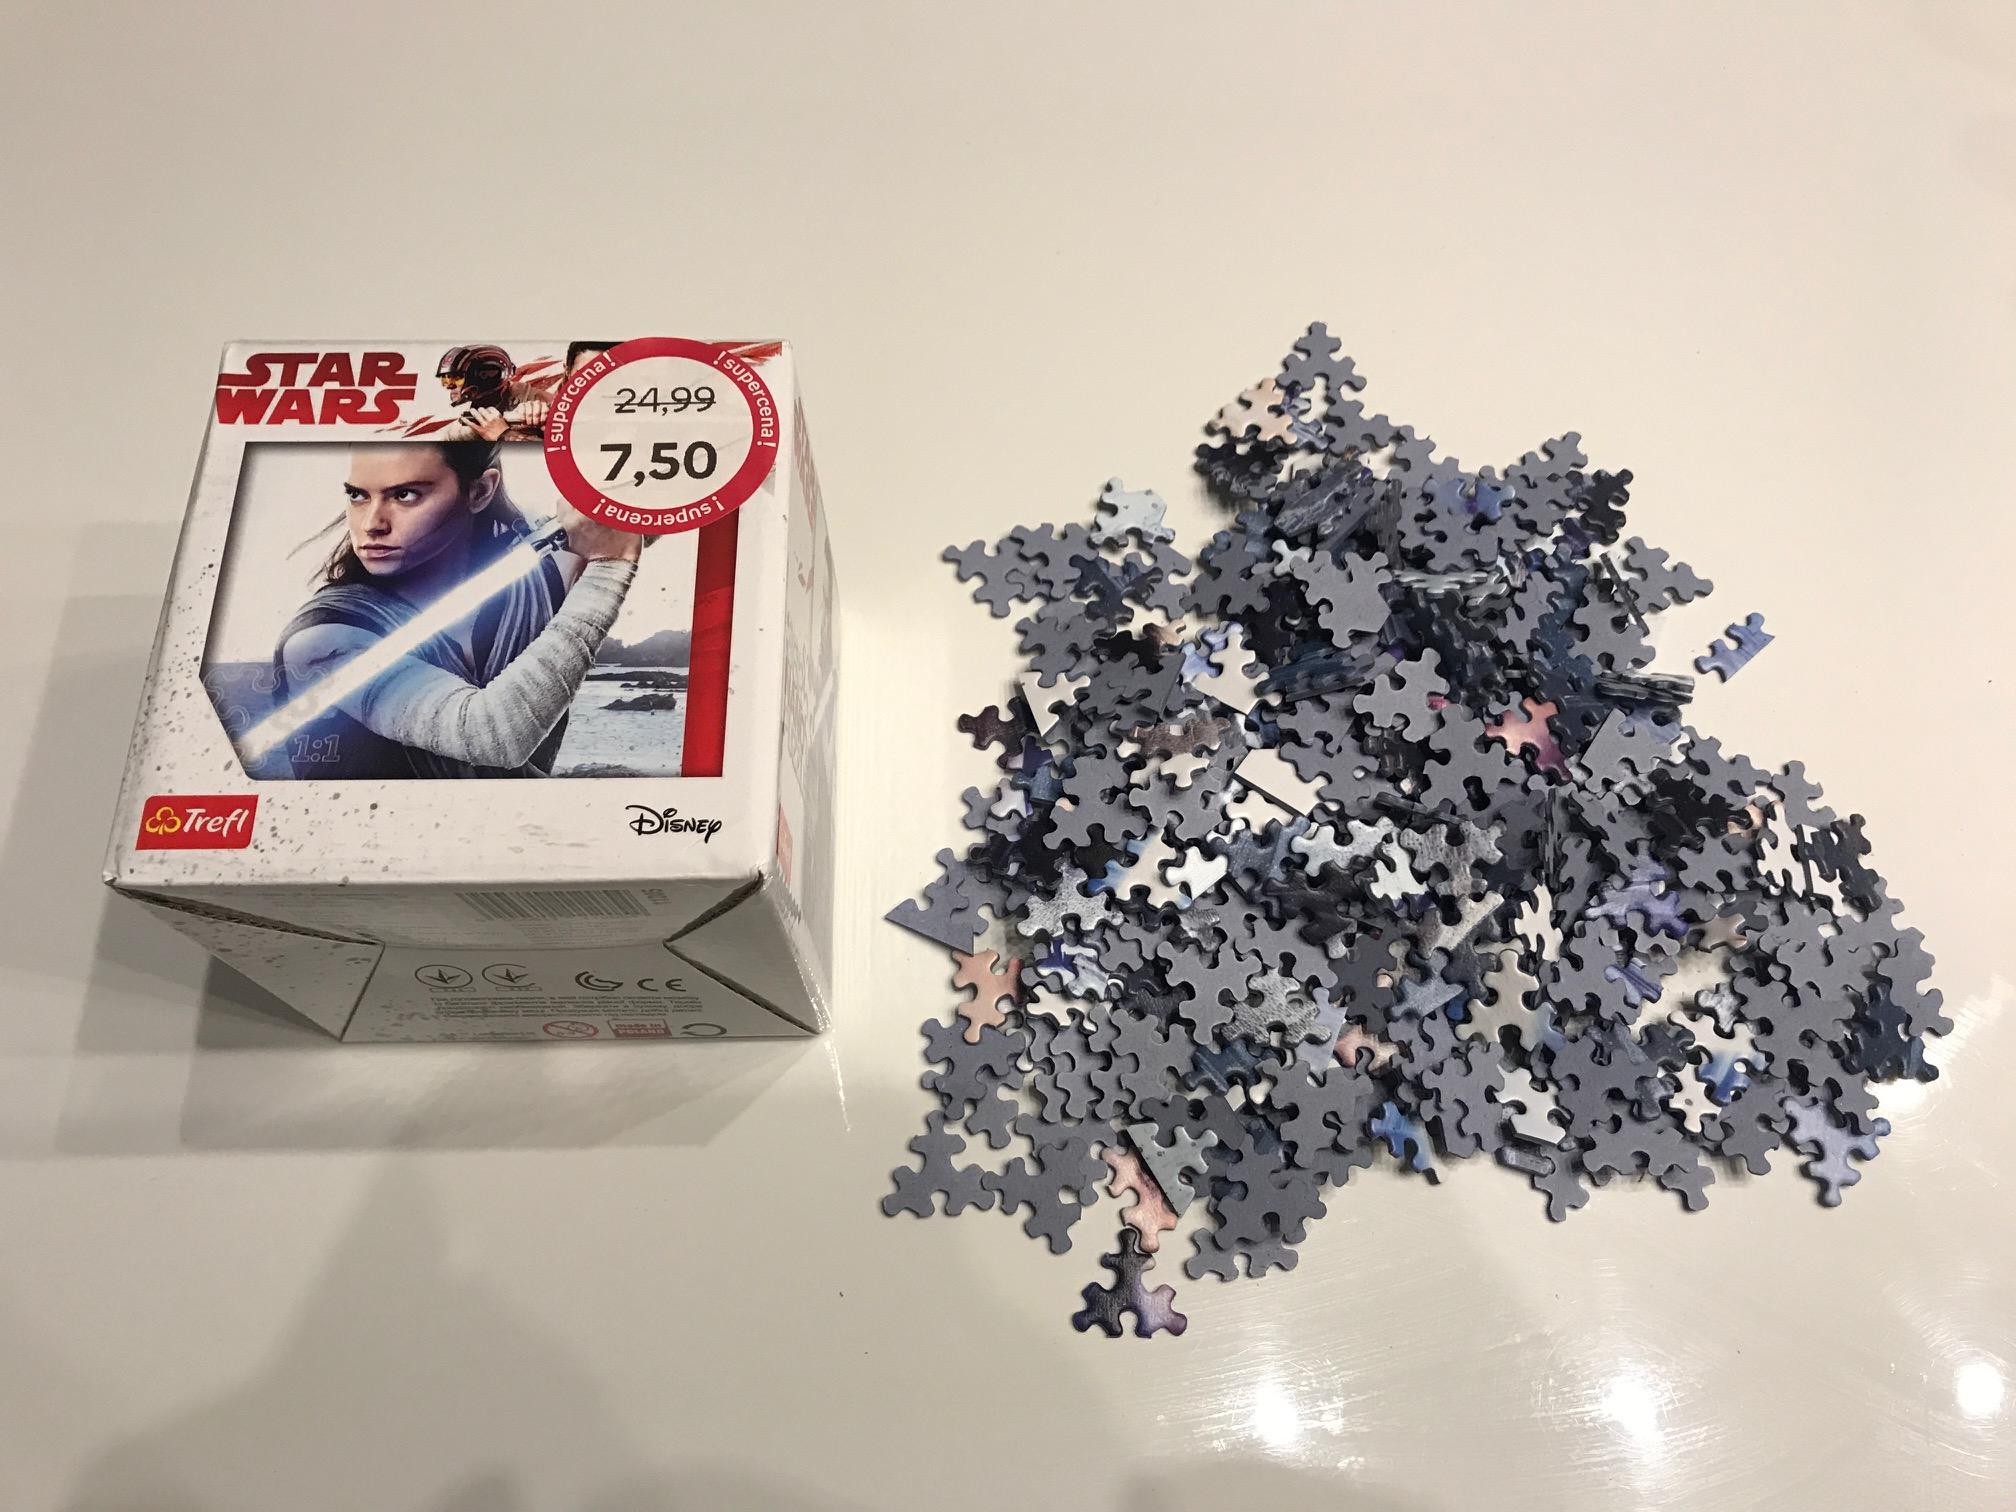 Empik Jaworzno Nano Puzzle Star Wars 362 Elementy.